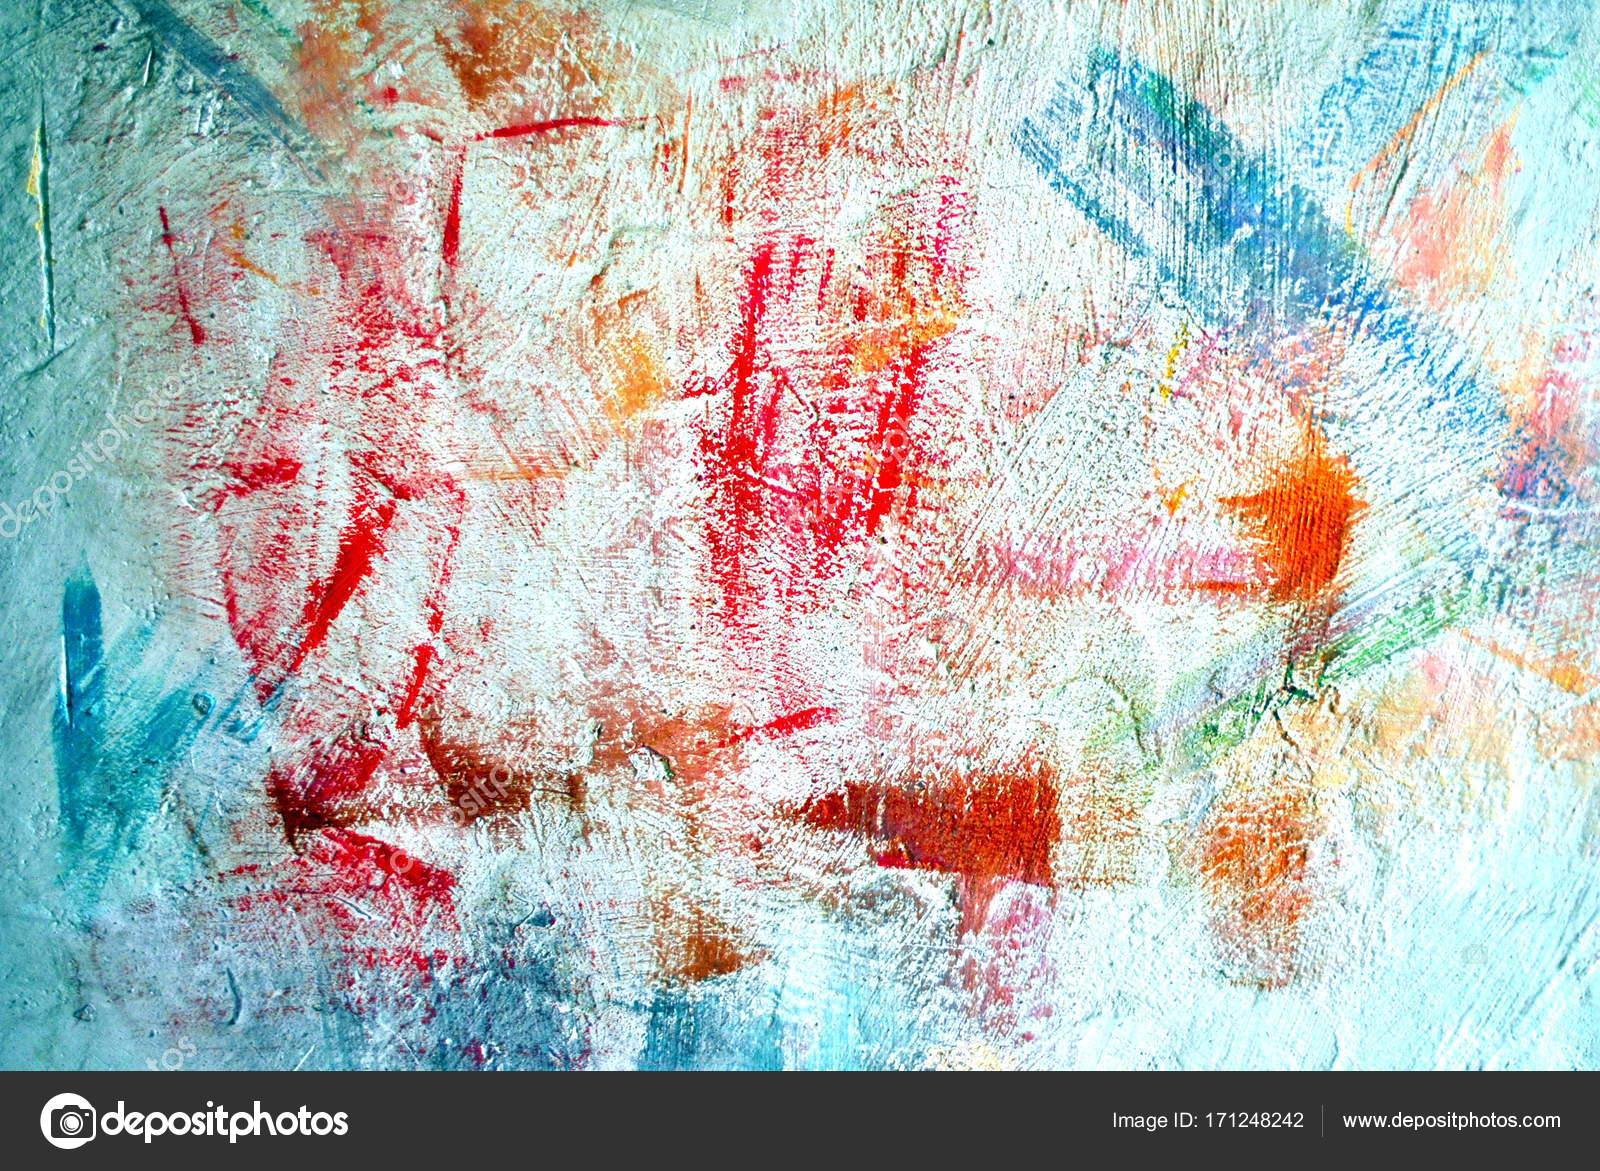 farbige flecken an der wand putzen — stockfoto © maxbax #171248242